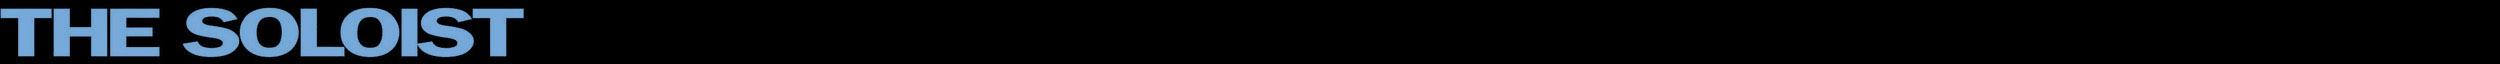 thesoloist_logo232.jpg